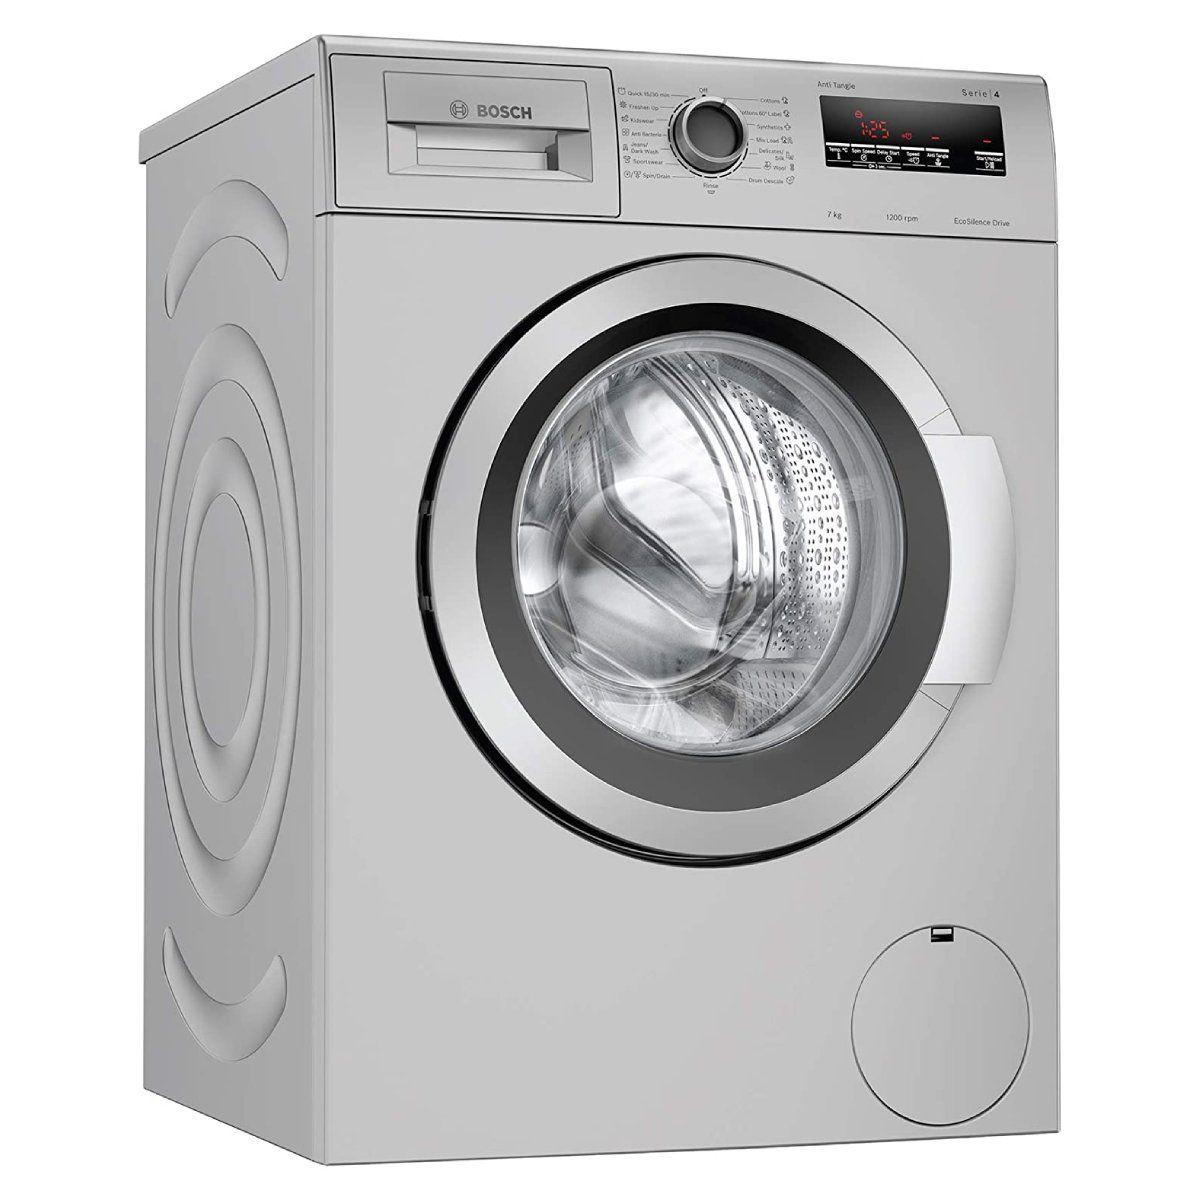 Bosch Fully-Automatic Front Loading Washing Machine (WAJ2416SIN)